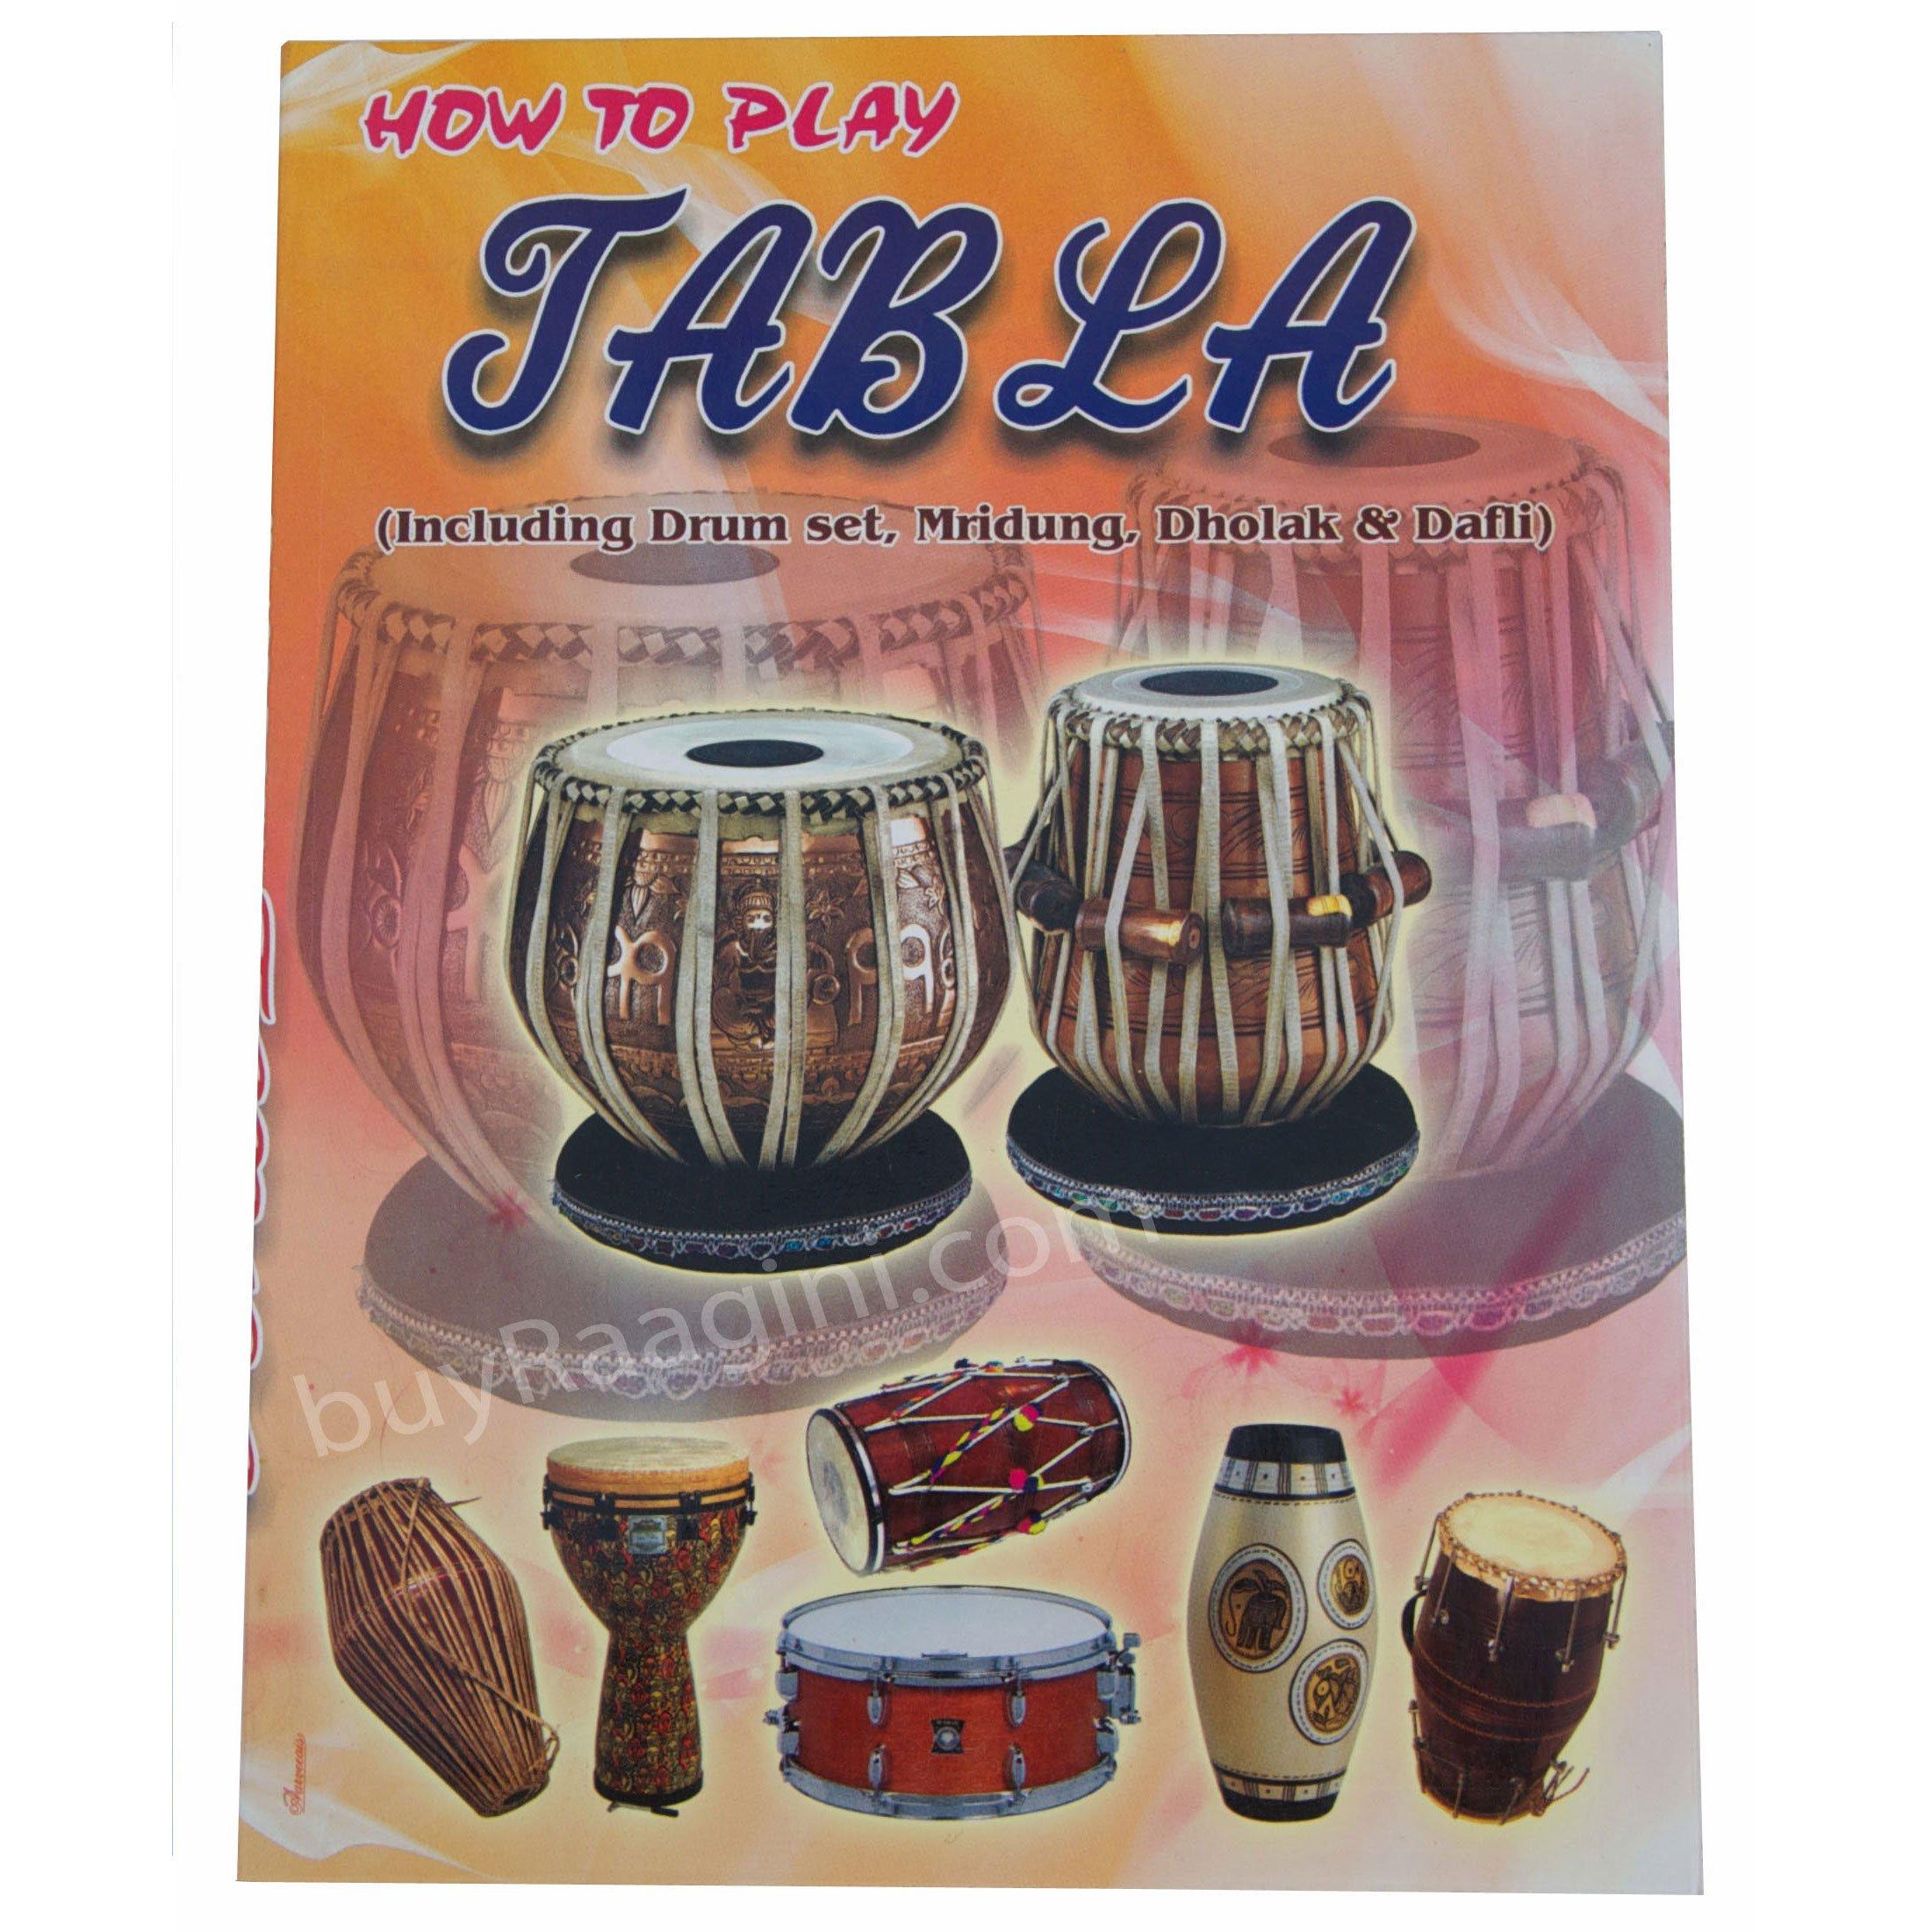 Tabla Set, Maharaja Musicals, 3.5 Kg Designer Golden Brass Bayan, Sheesham Tabla Dayan, Professional Drums, Padded Bag, Book, Hammer, Cushions, Cover, Tabla Drums Indian (PDI-FG) by Maharaja Musicals